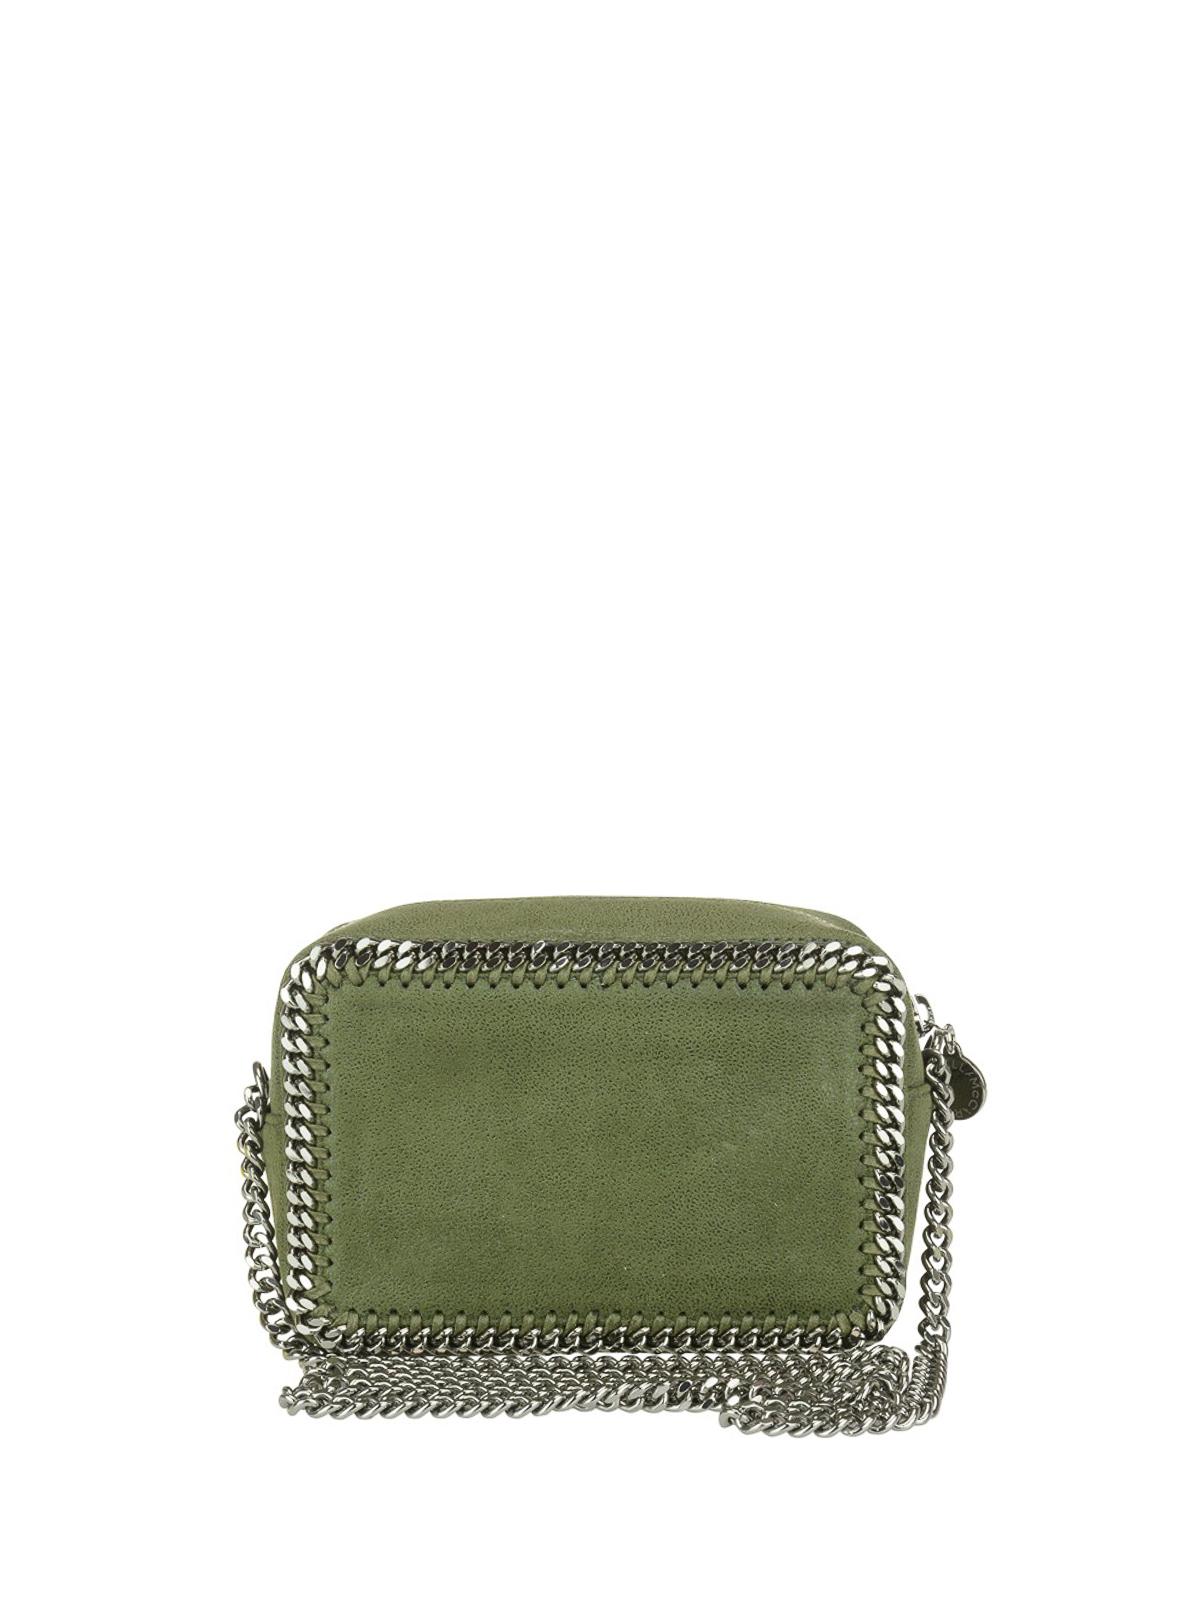 331fe1a942 iKRIX STELLA McCARTNEY  cross body bags - Falabella olive green crossbody  bag